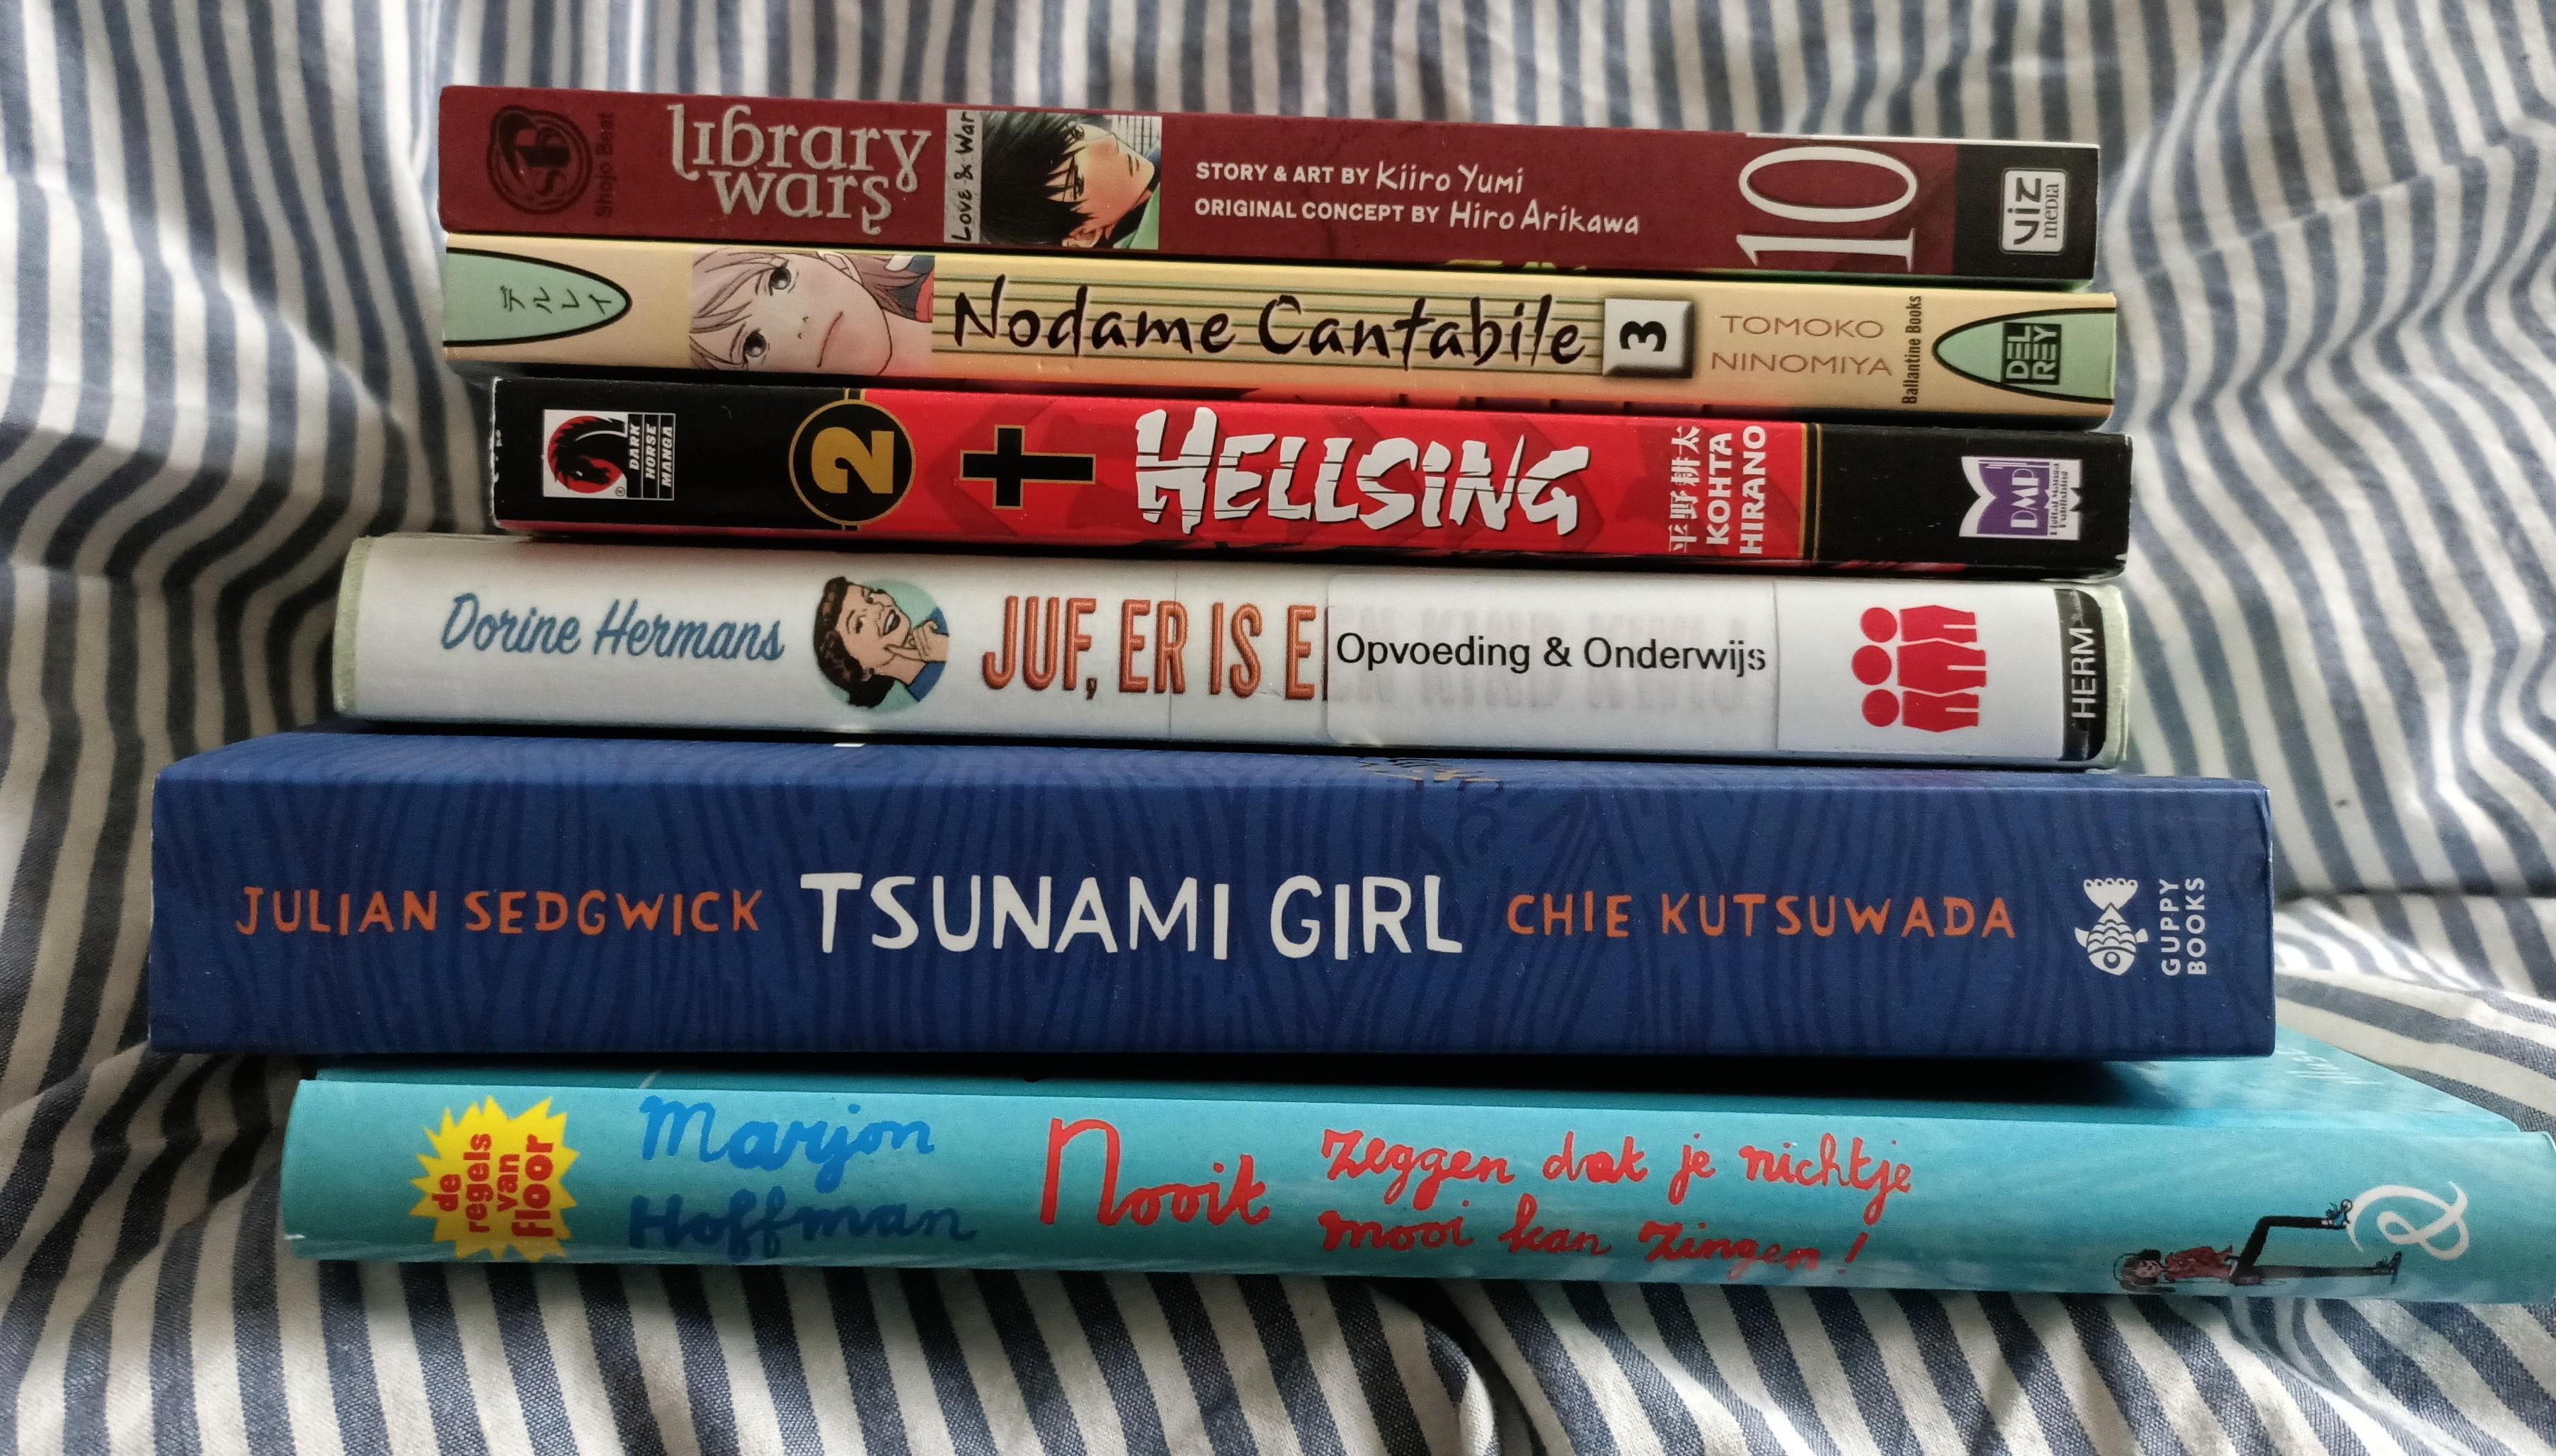 Reading, books, tbr, manga, library